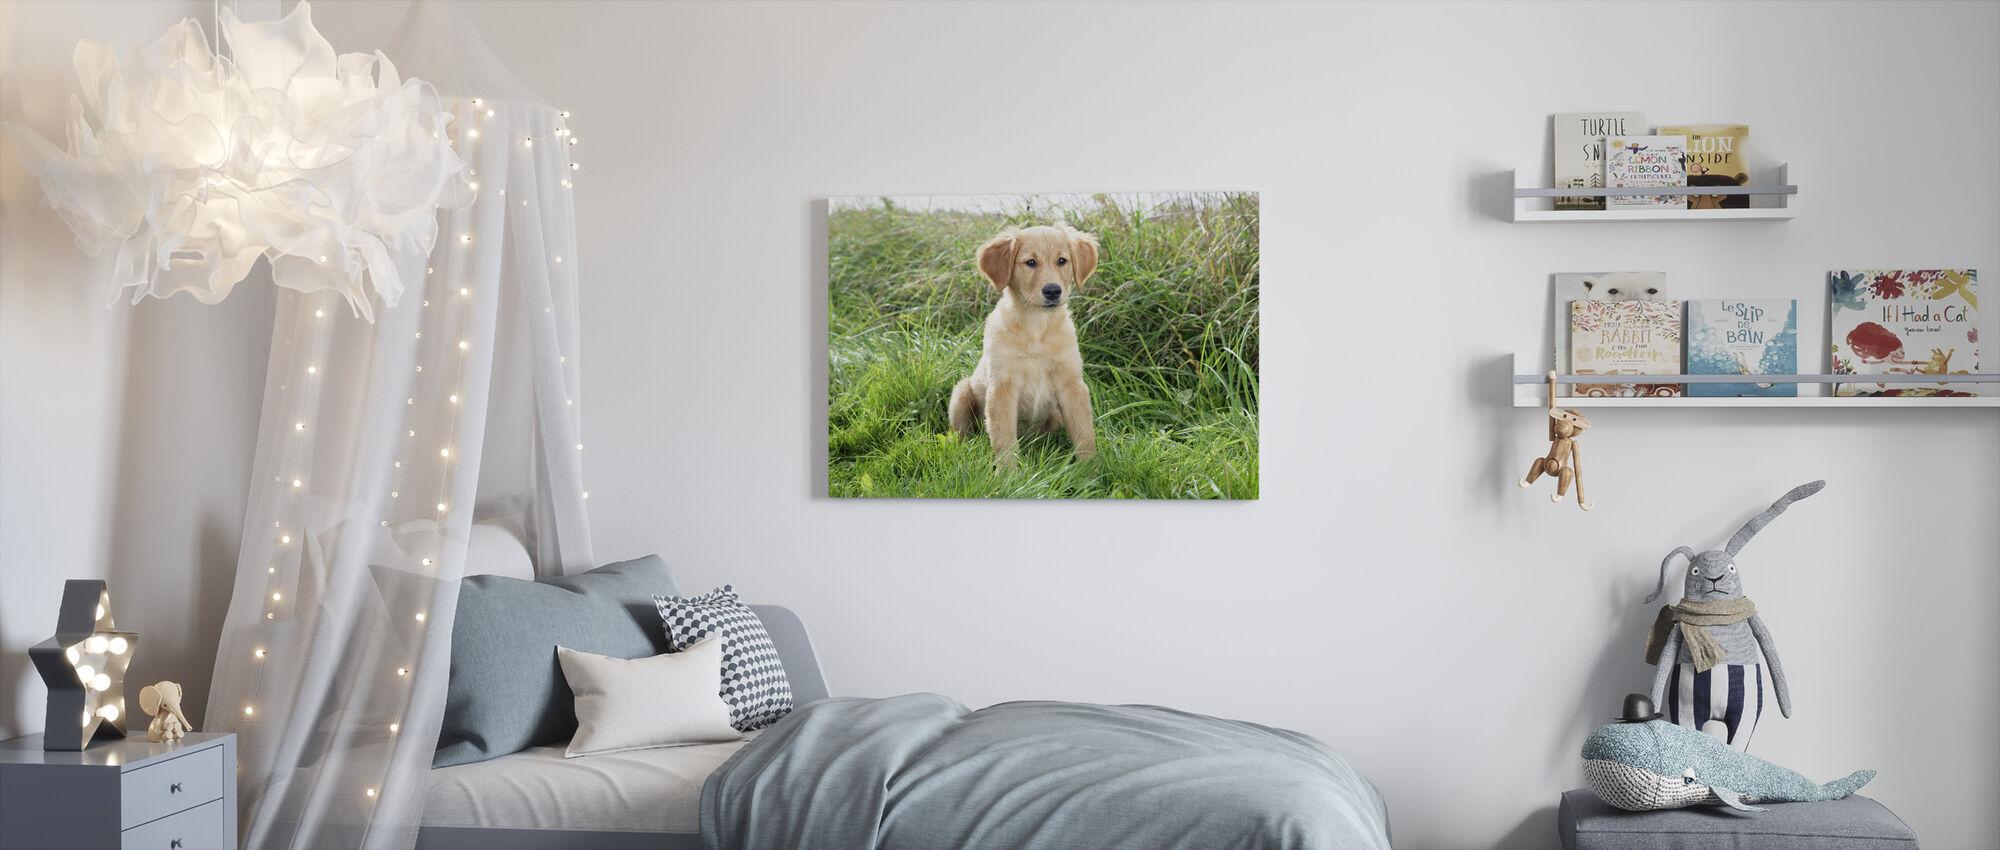 Golden Retriever Puppy in Meadow - Canvas print - Kids Room